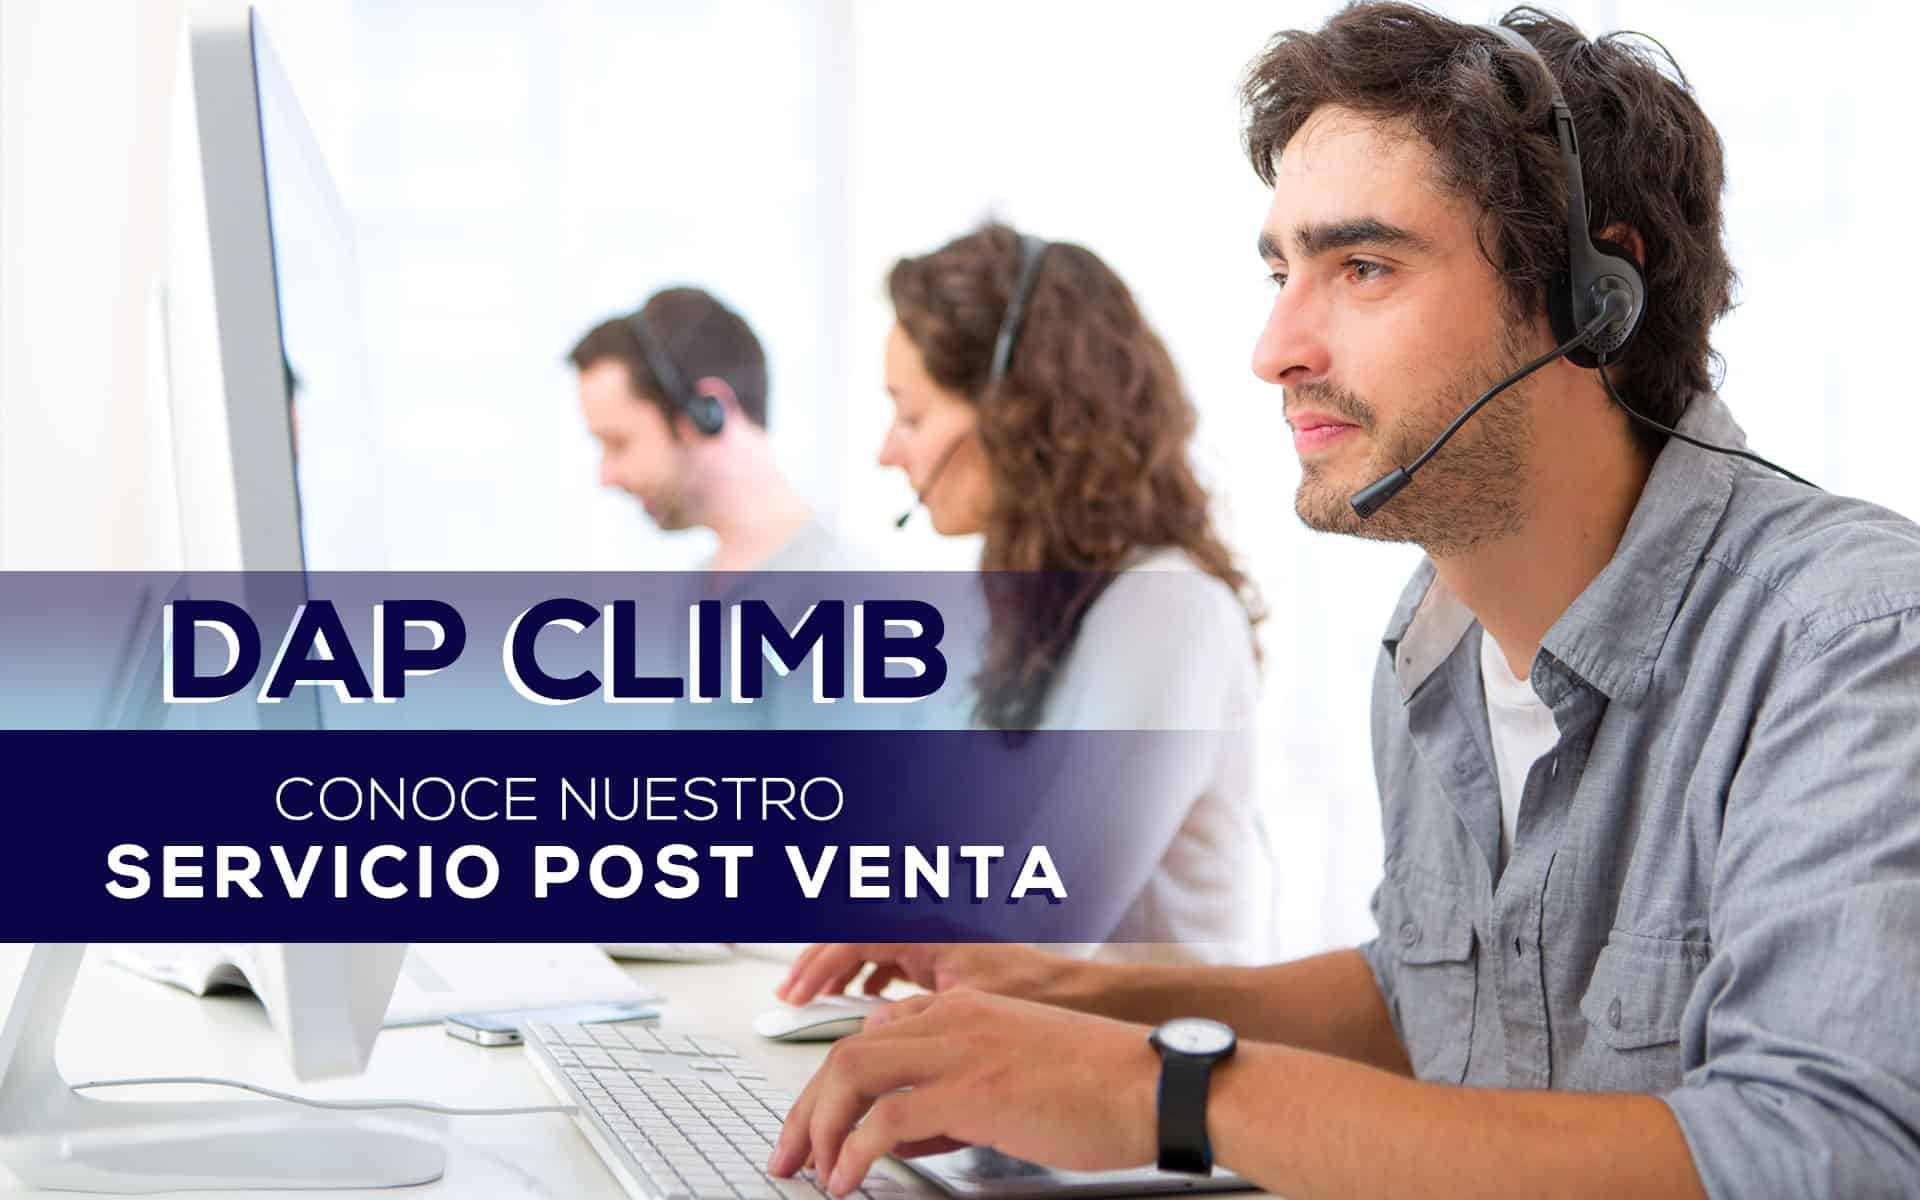 DAP CLIMB Servicio Post-venta